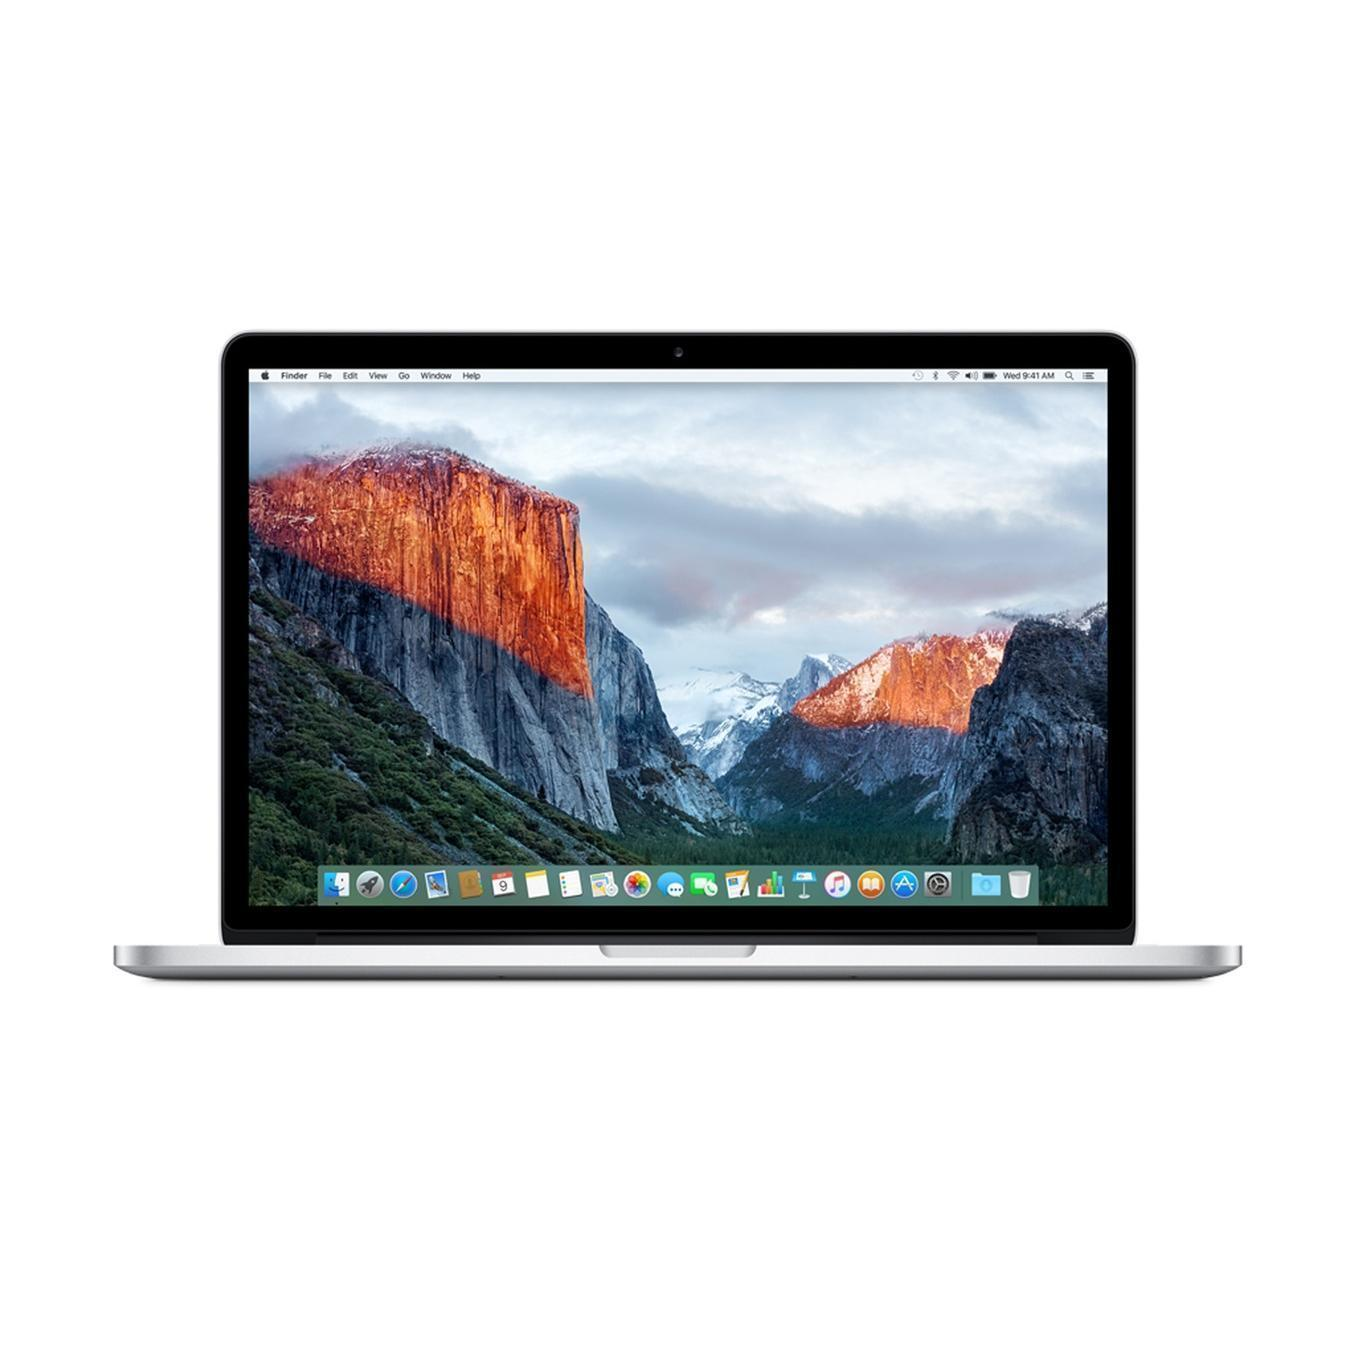 MacBook Pro Retina 15.4-inch (2015) - Core i7 - 16GB - SSD 256 GB QWERTY - Italian